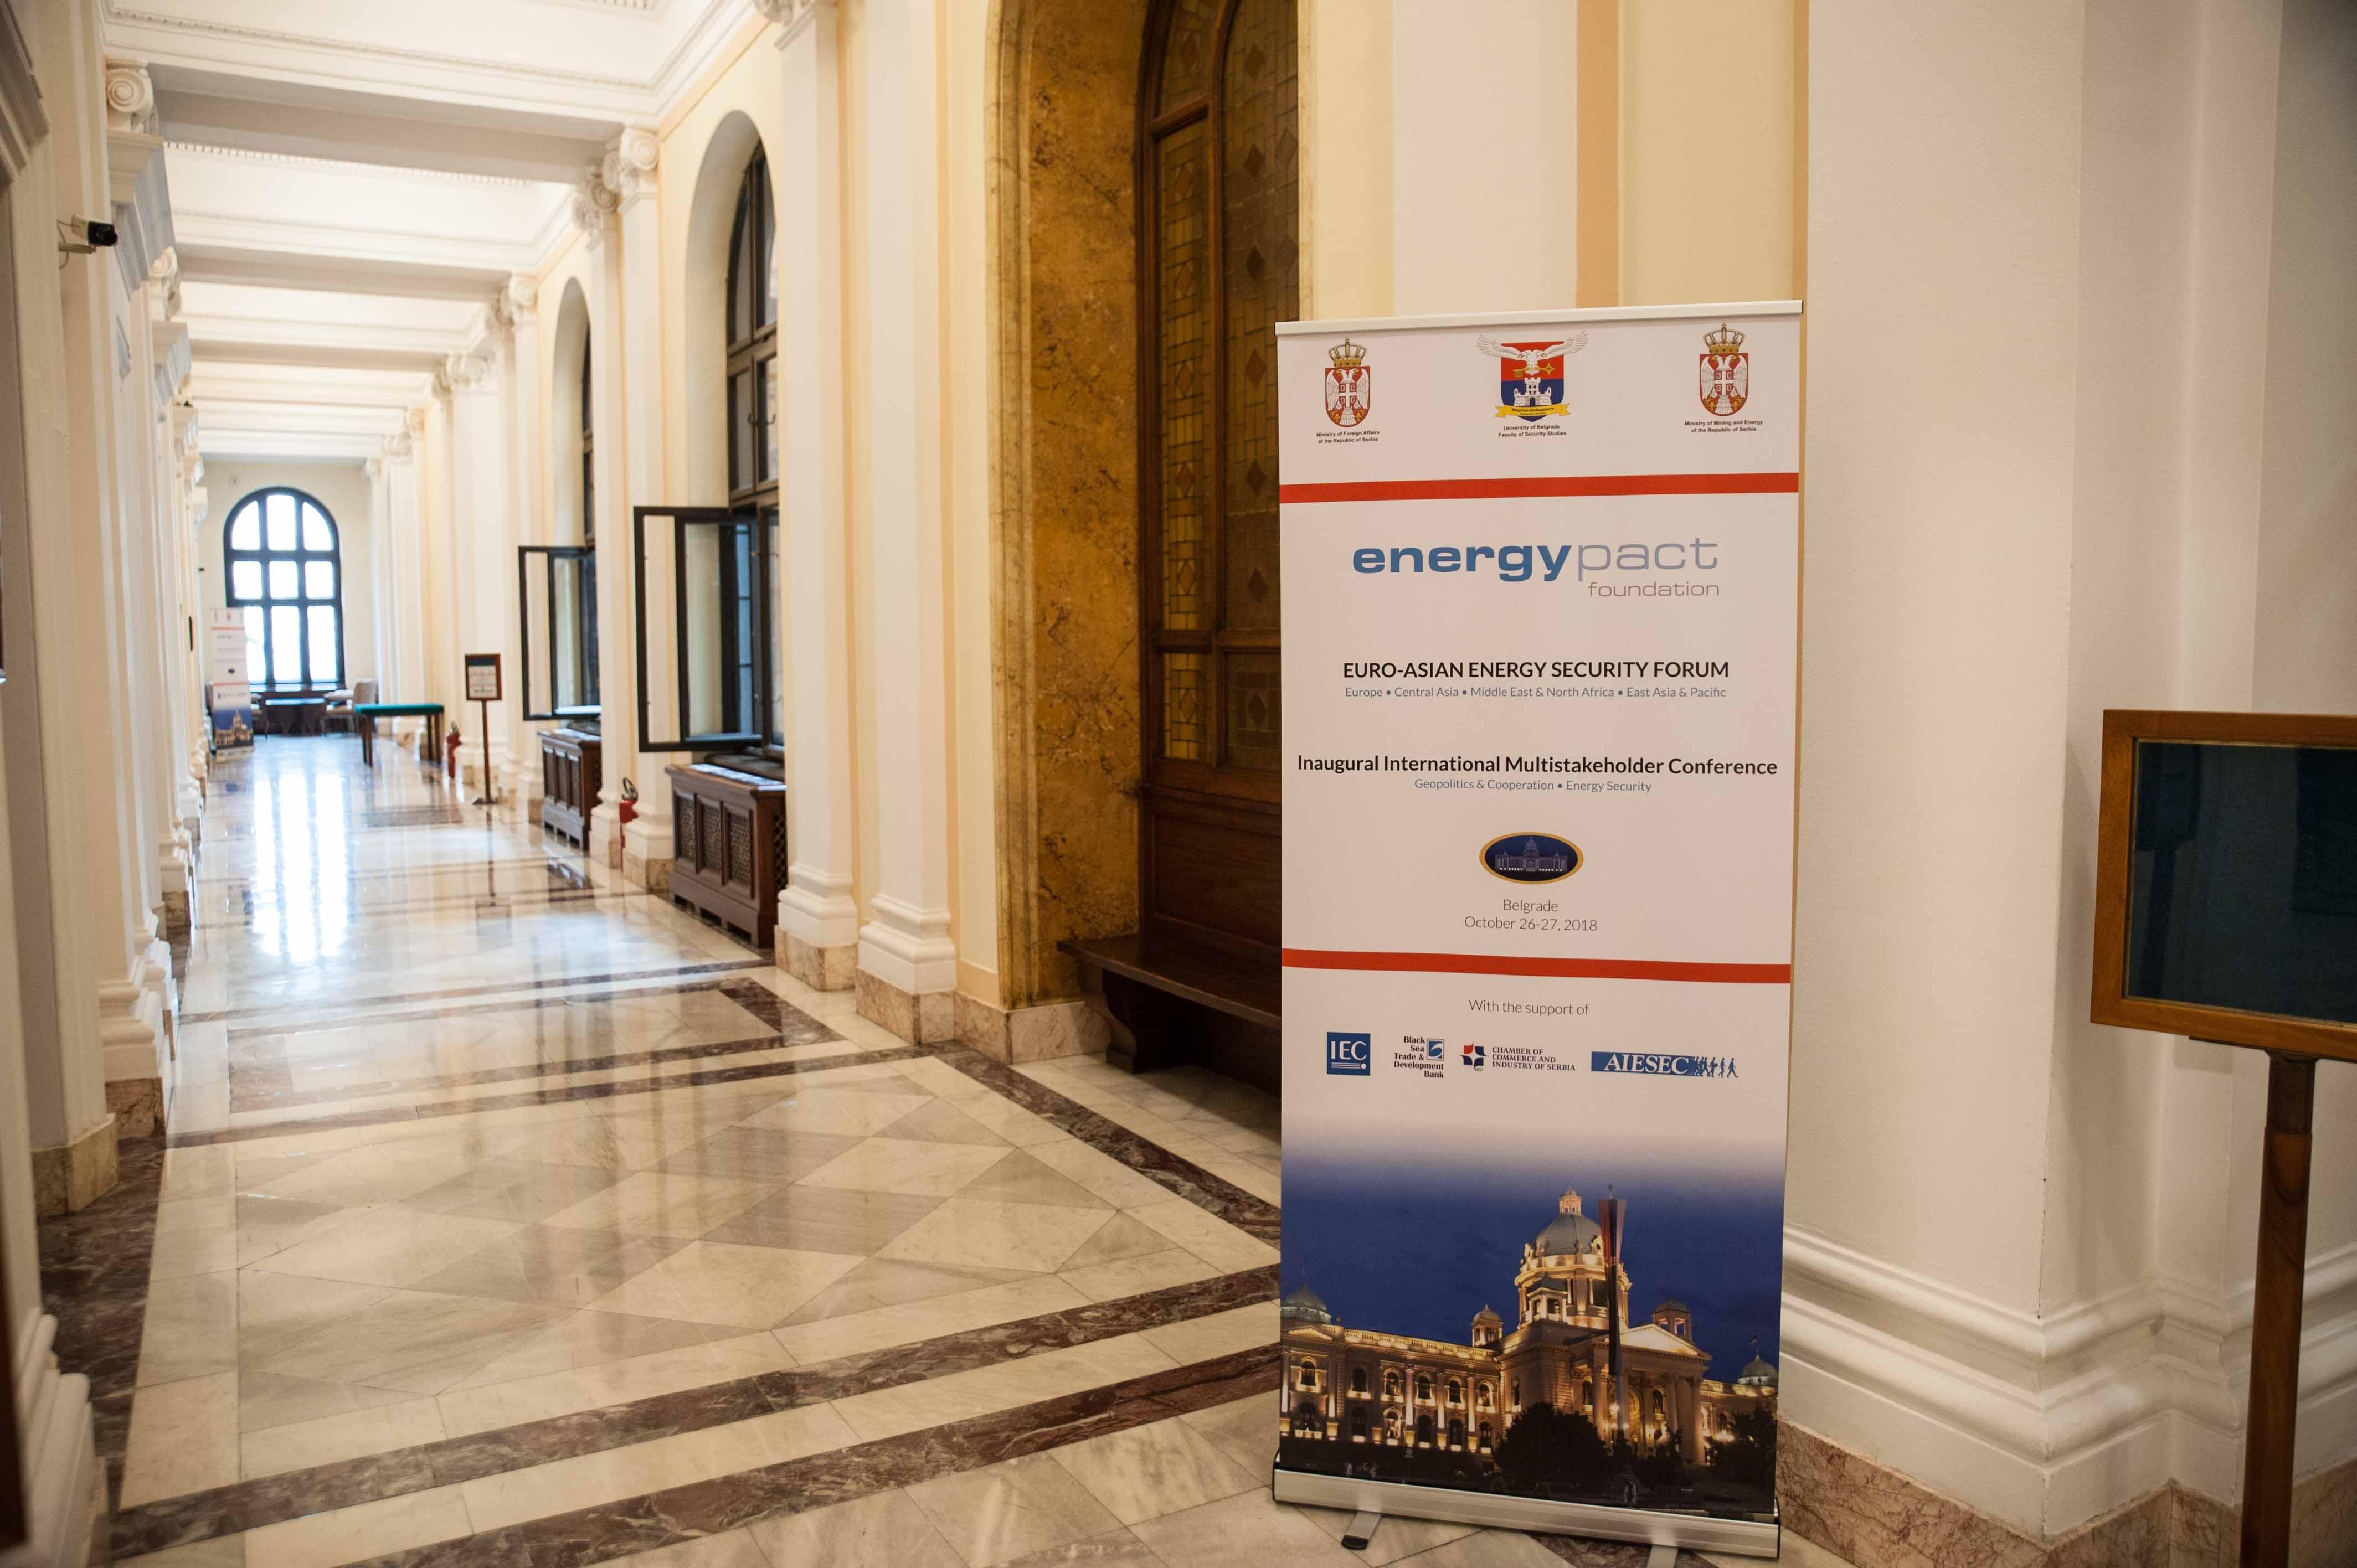 energypact33